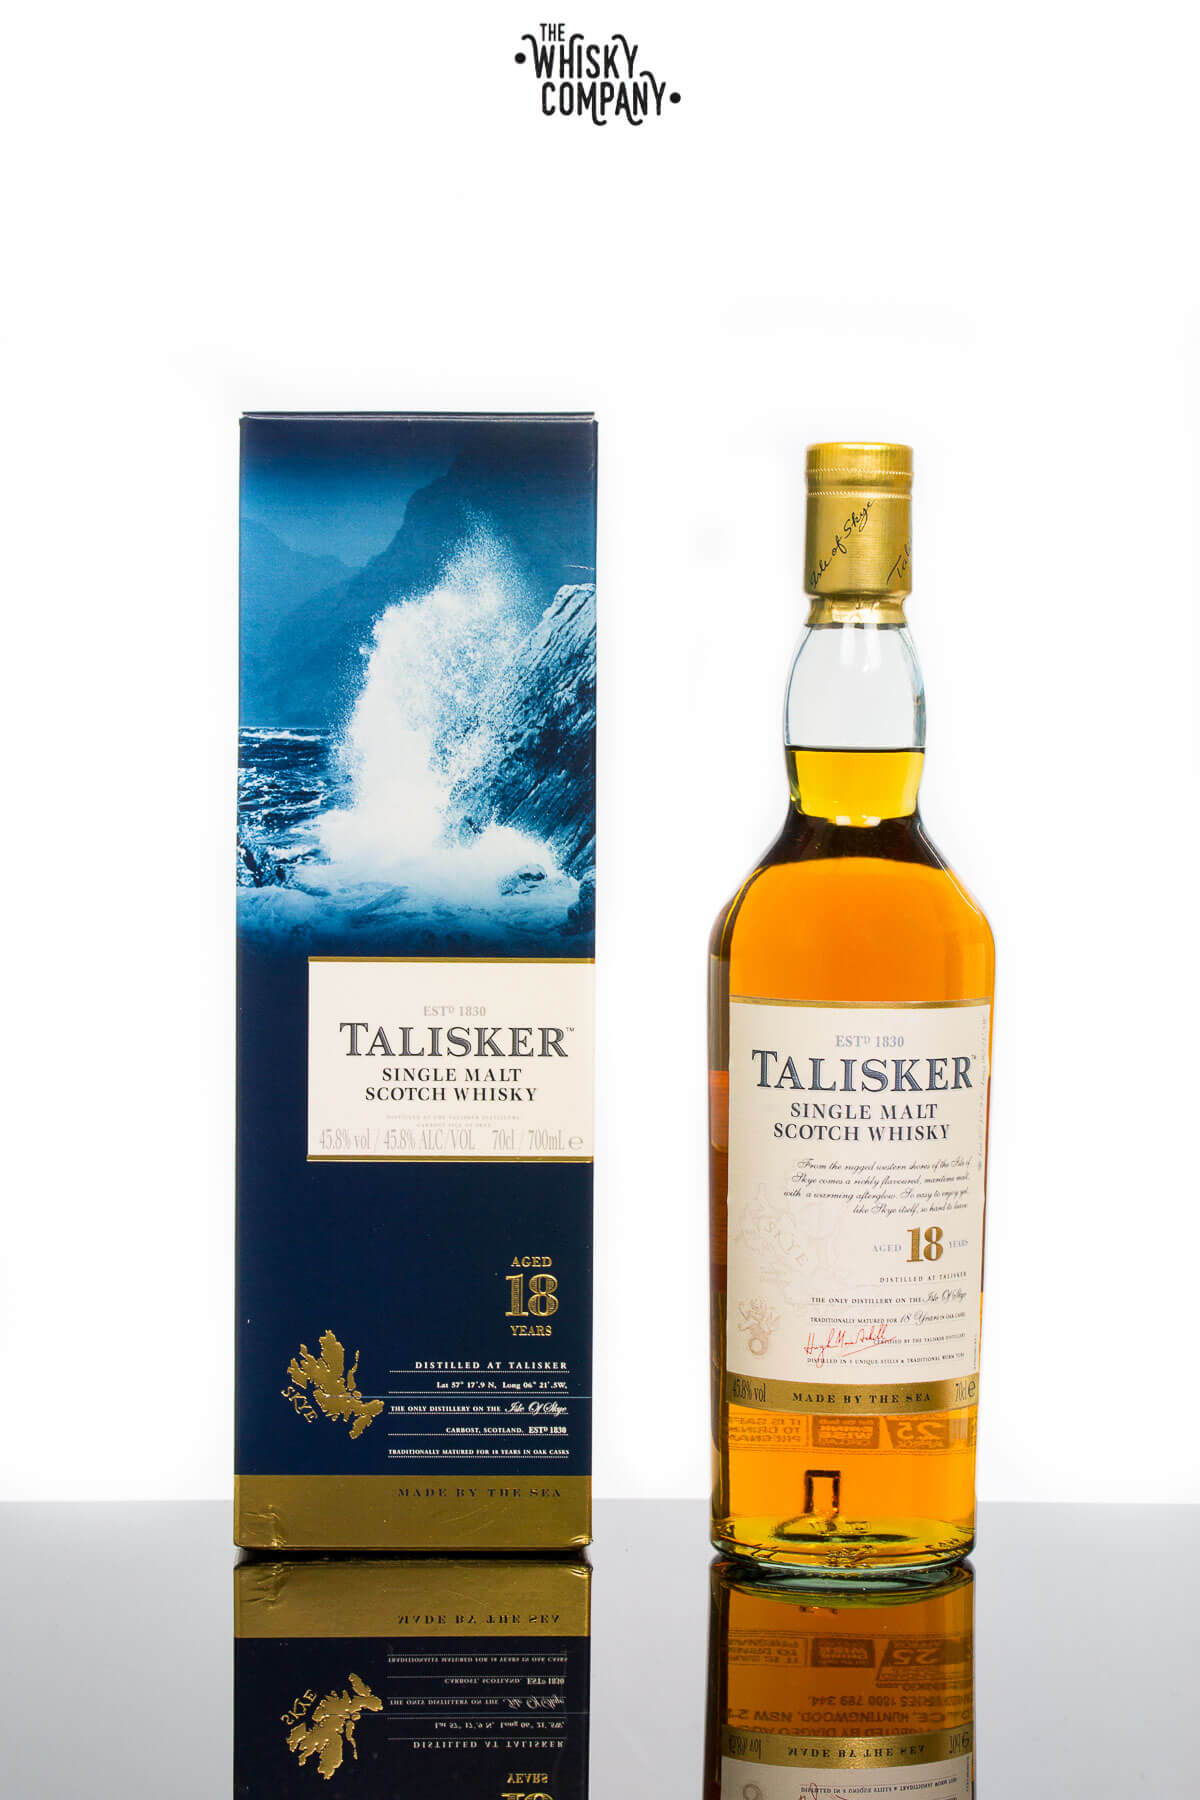 Talisker Aged 18 Years Island Single Malt Scotch Whisky